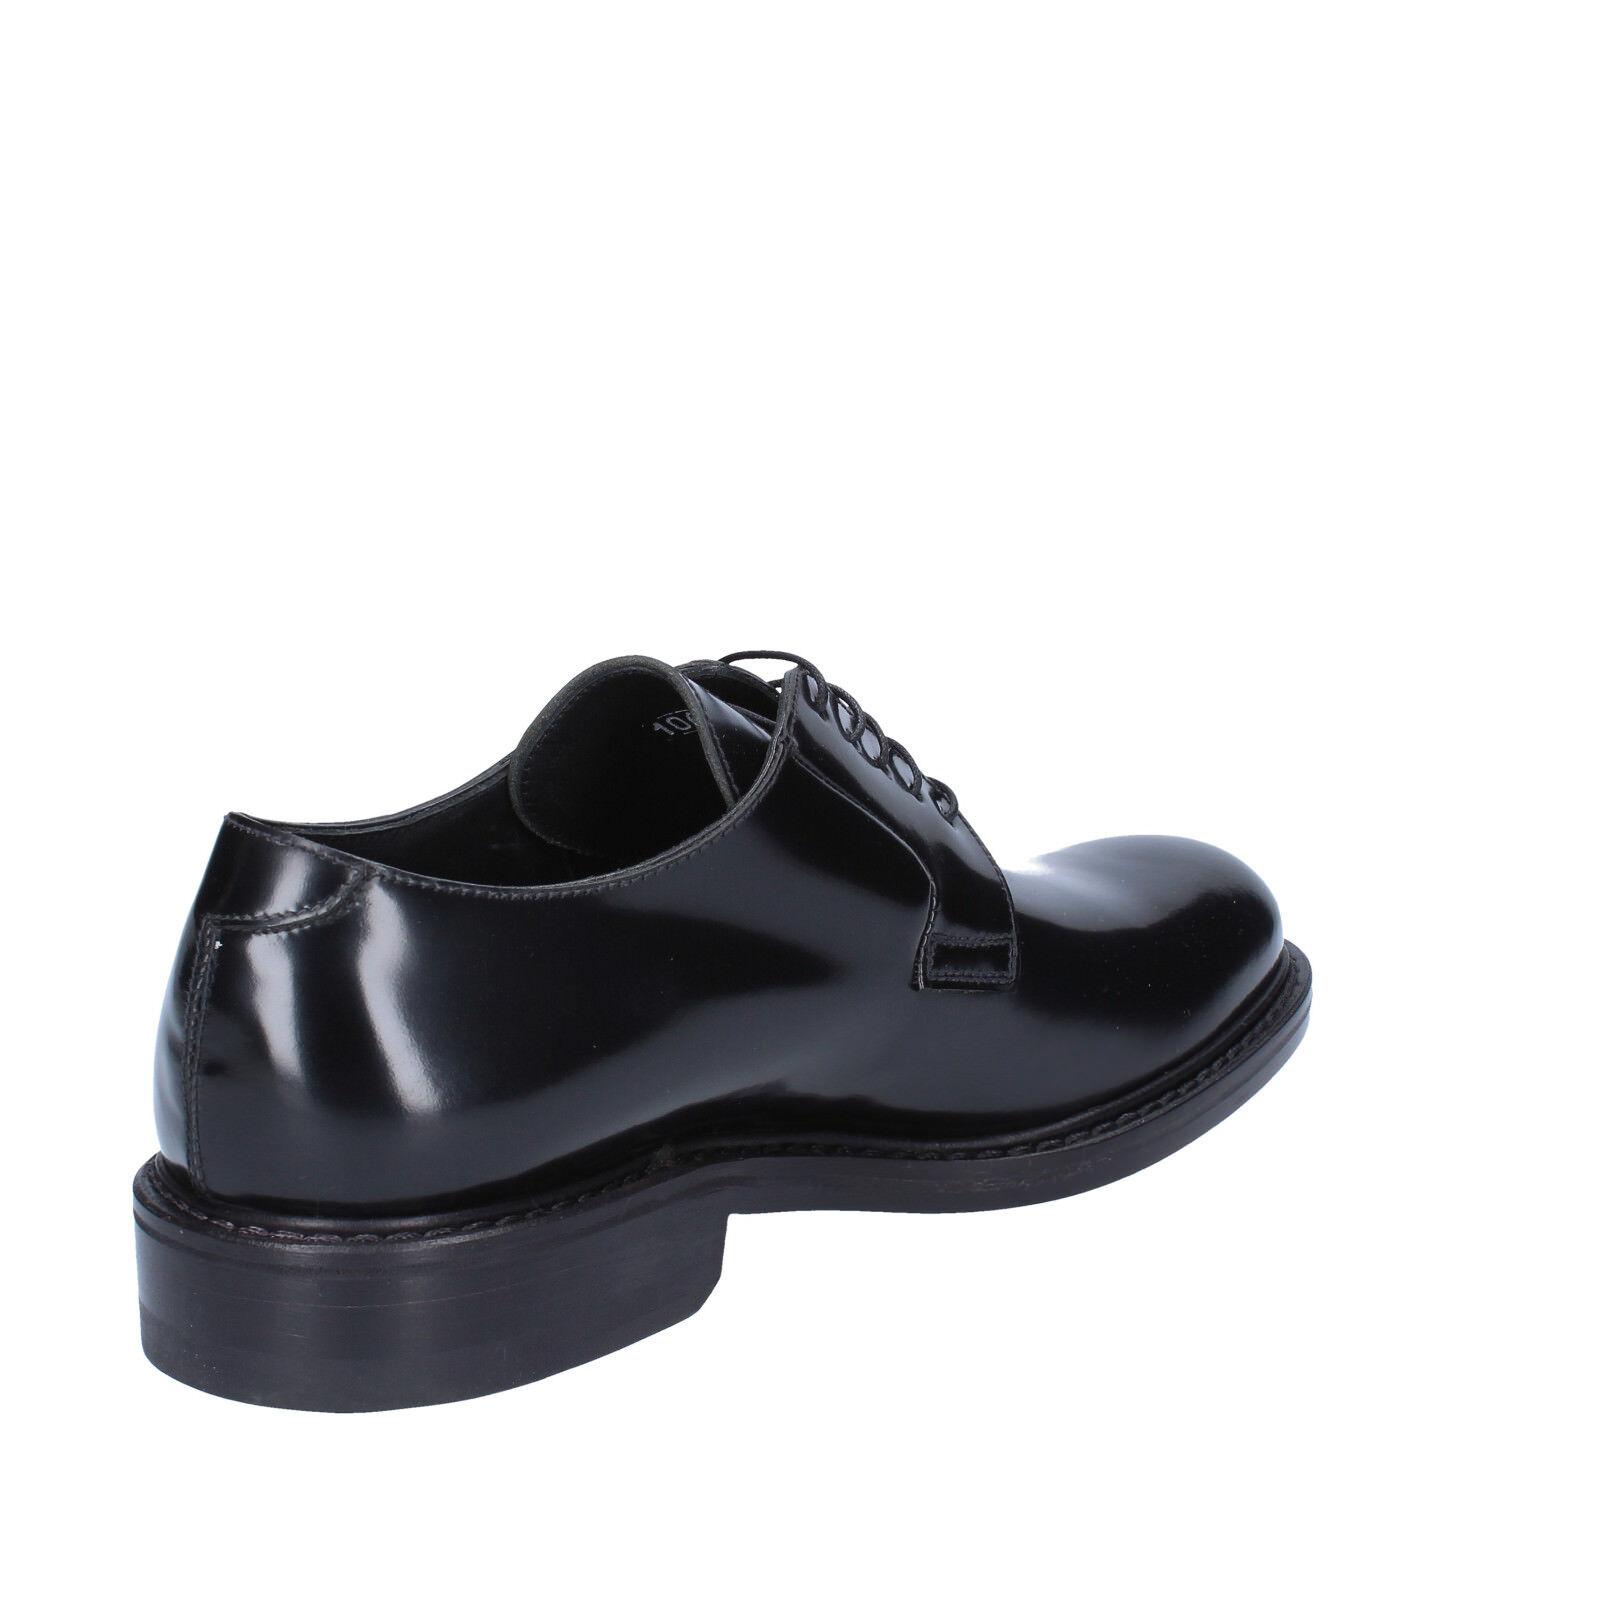 Scarpe da Uomo Di Mella 39 elegante nero lucida pelle pelle pelle bz46-b da7650